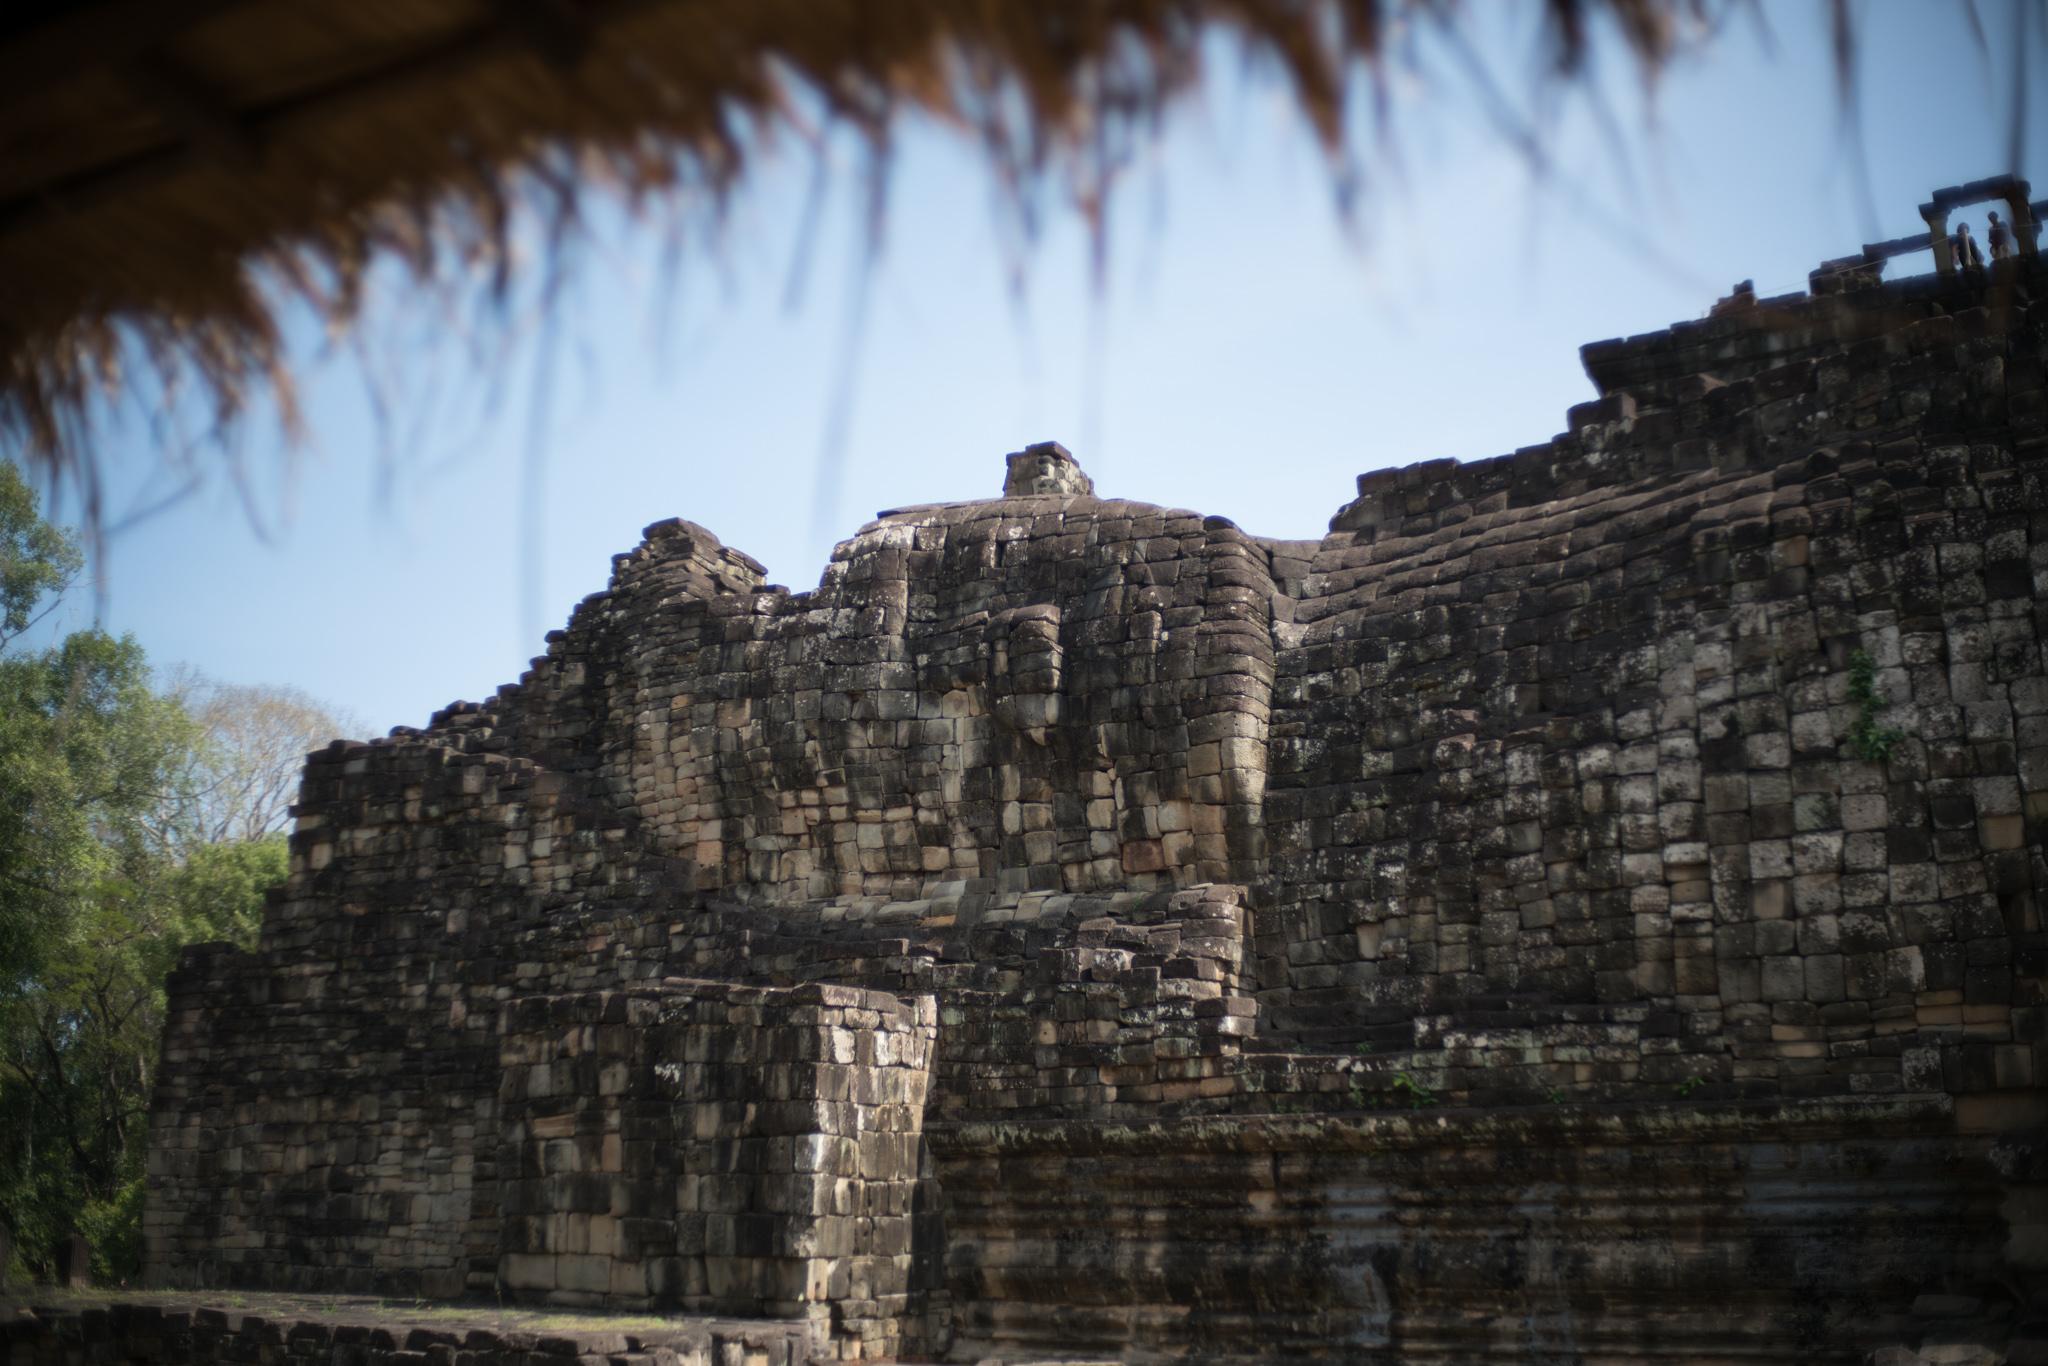 January 2017, Baphuon (ប្រាសាទបាពួន), Angkor (អង្គរ), Kingdom of Cambodia (ព្រះរាជាណាចក្រកម្ពុជា).